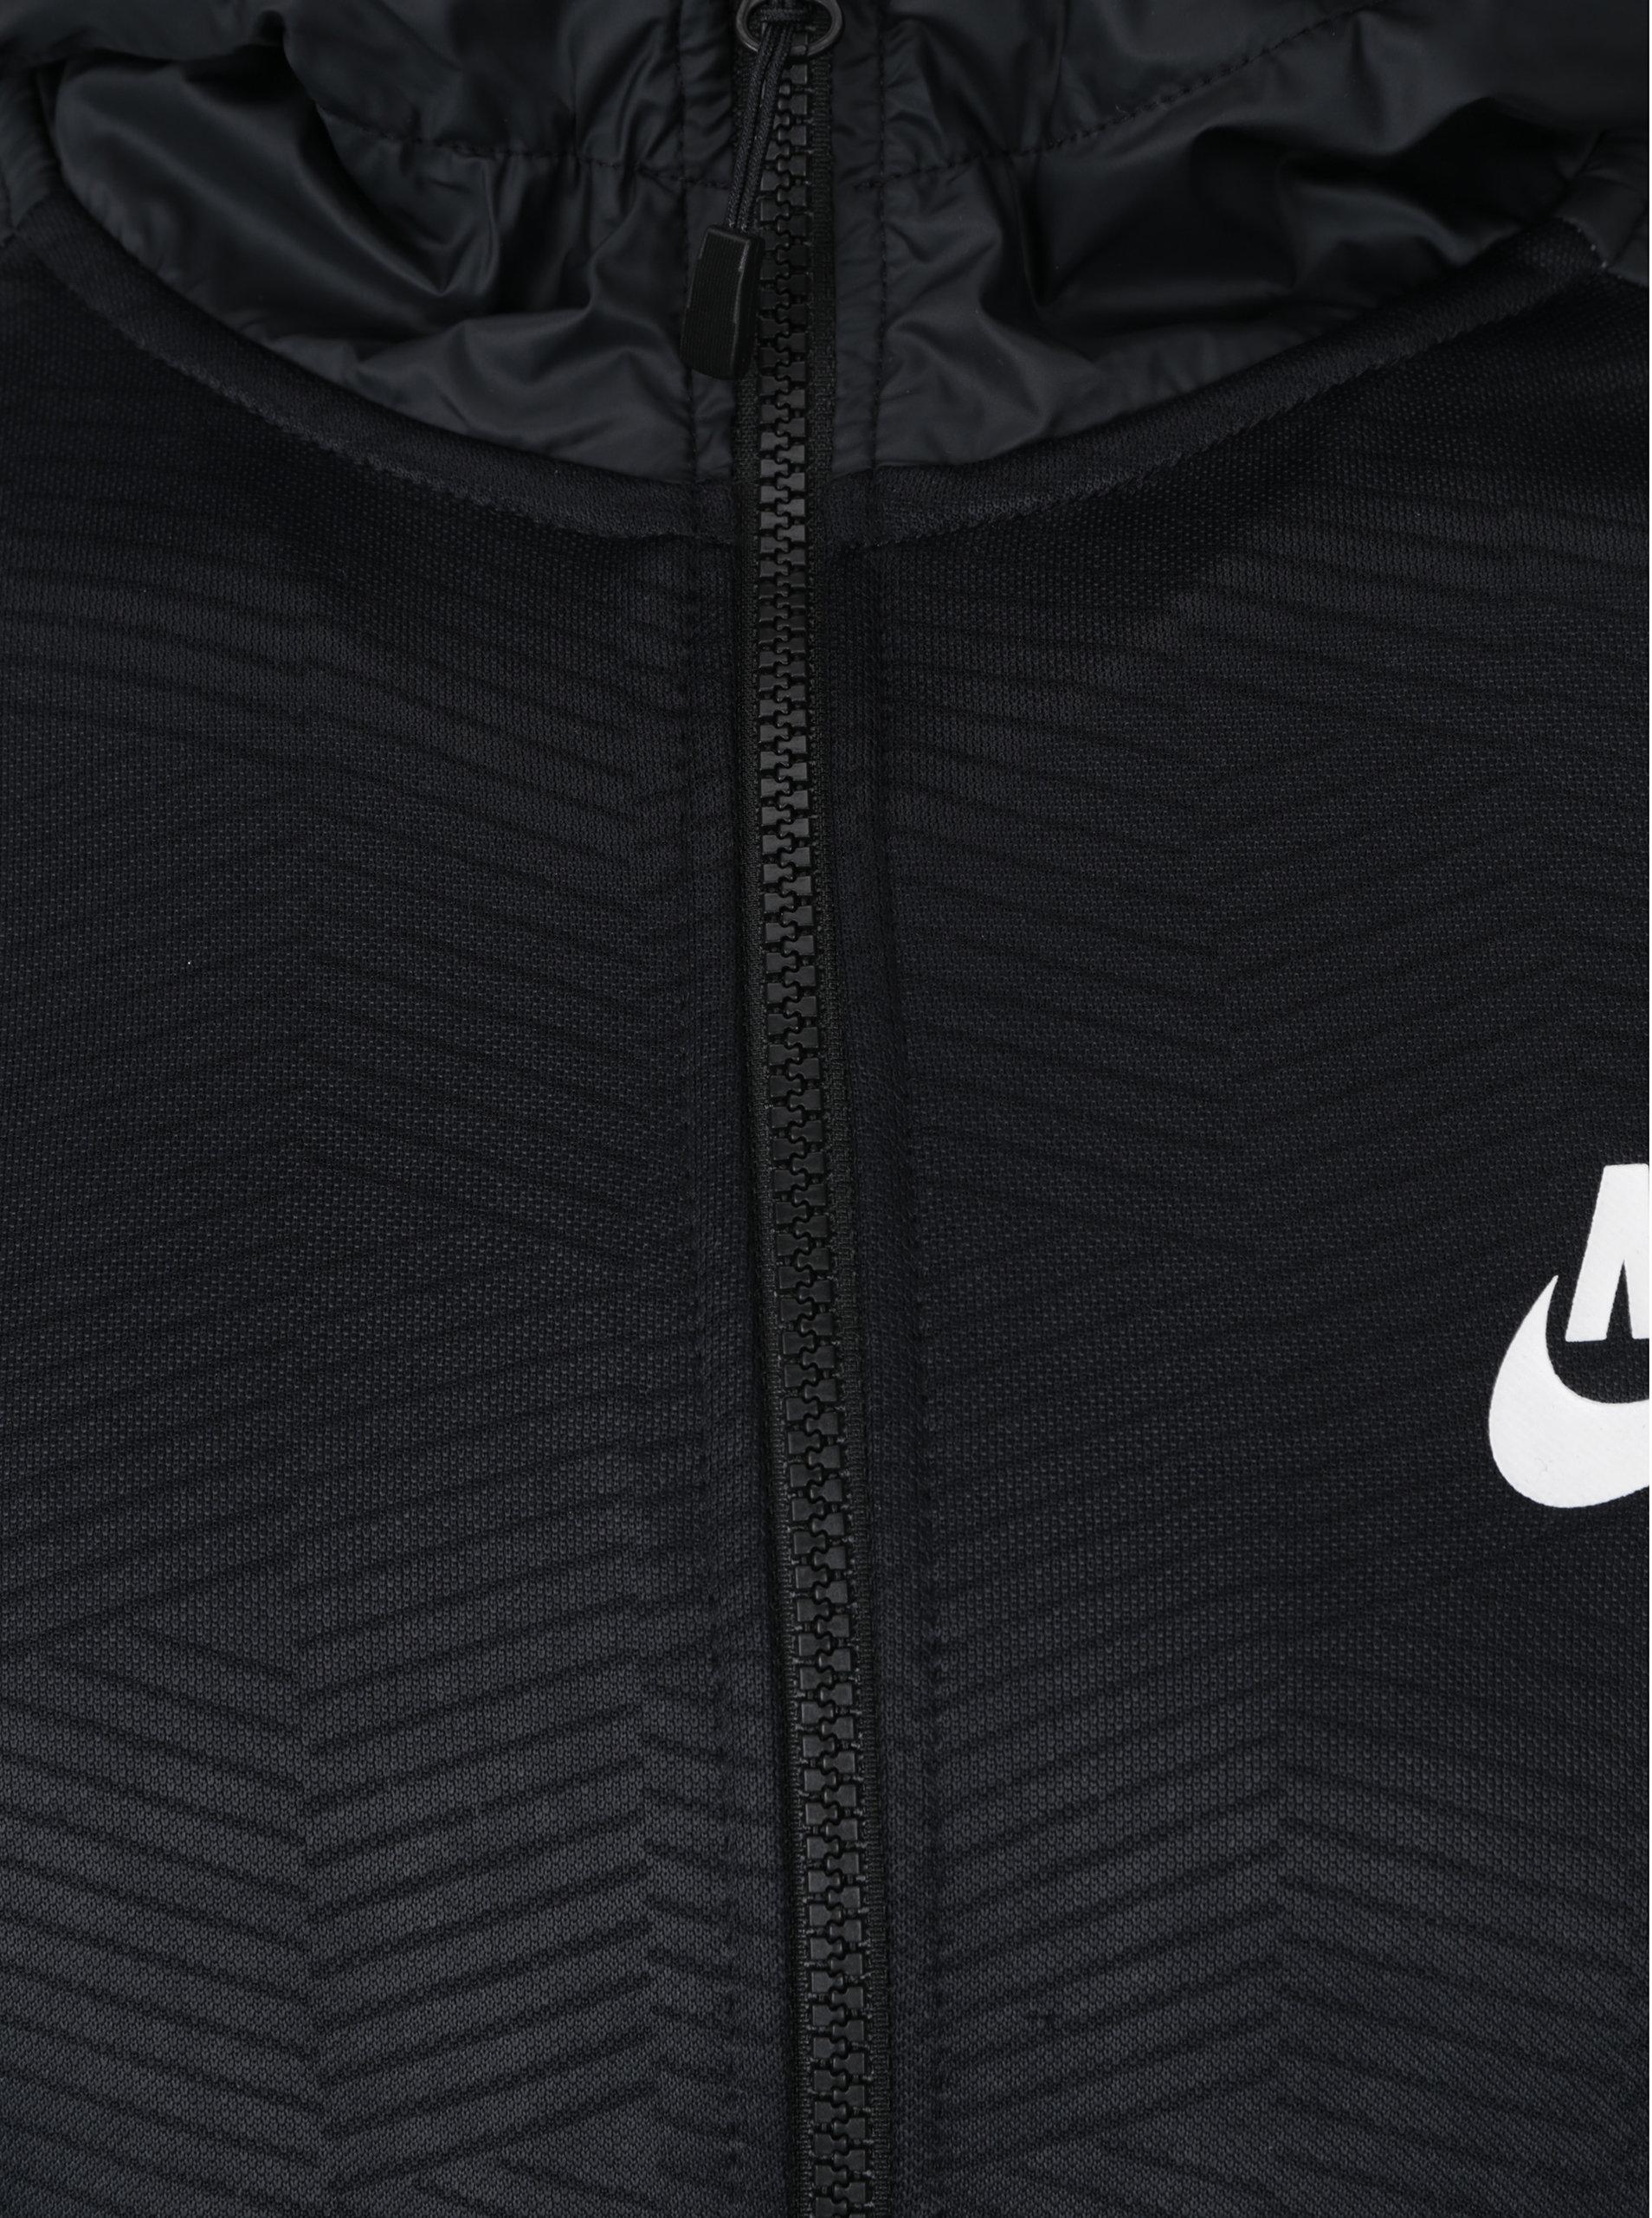 2aae65d1a9 Čierno-sivá pánska mikina s kapucňou Nike NSW ...